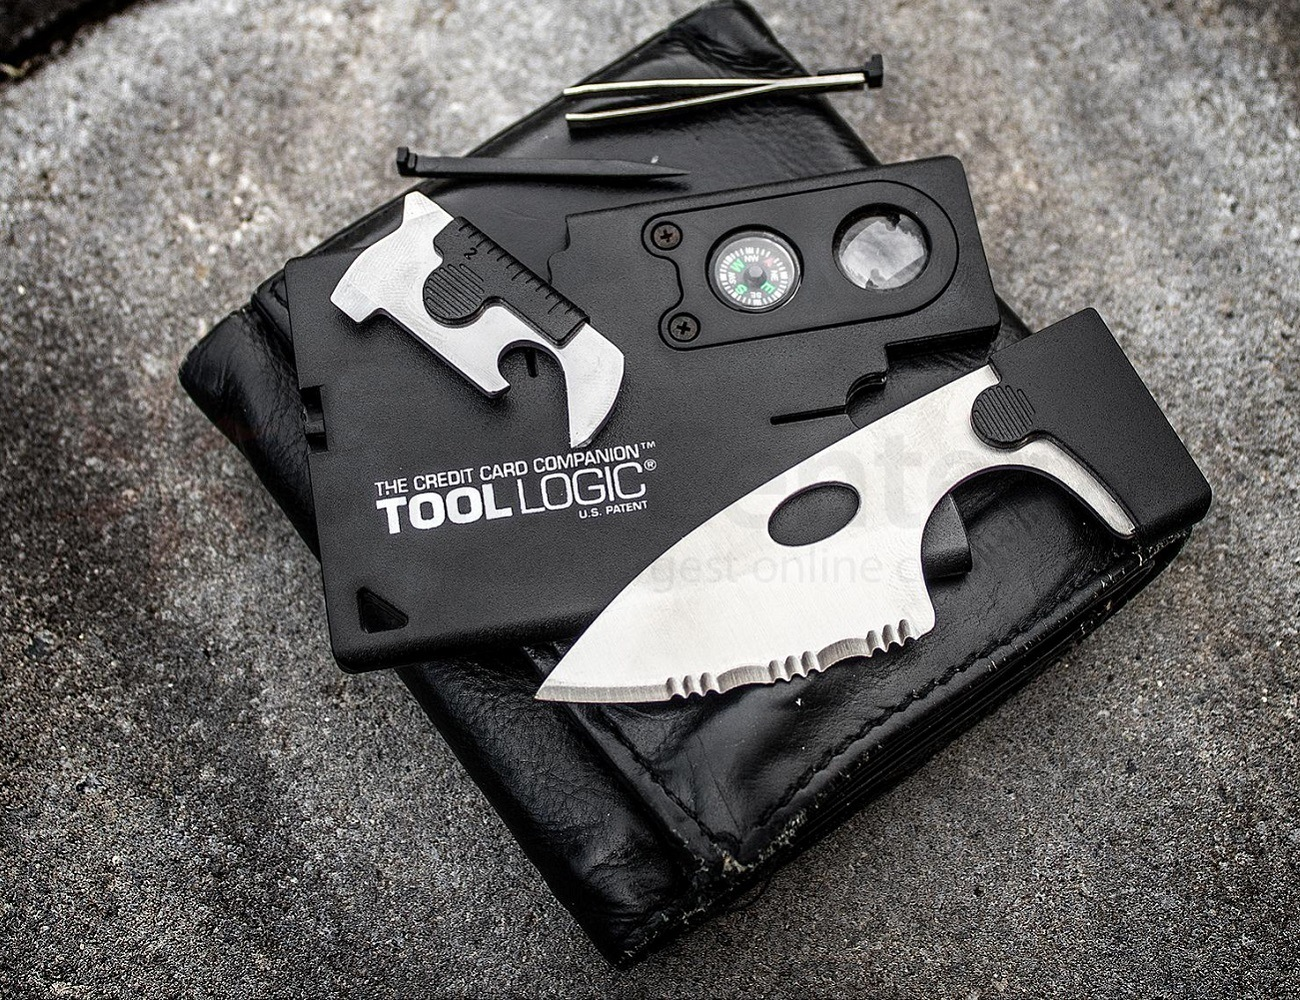 Tool+Logic+Credit+Card+Companion